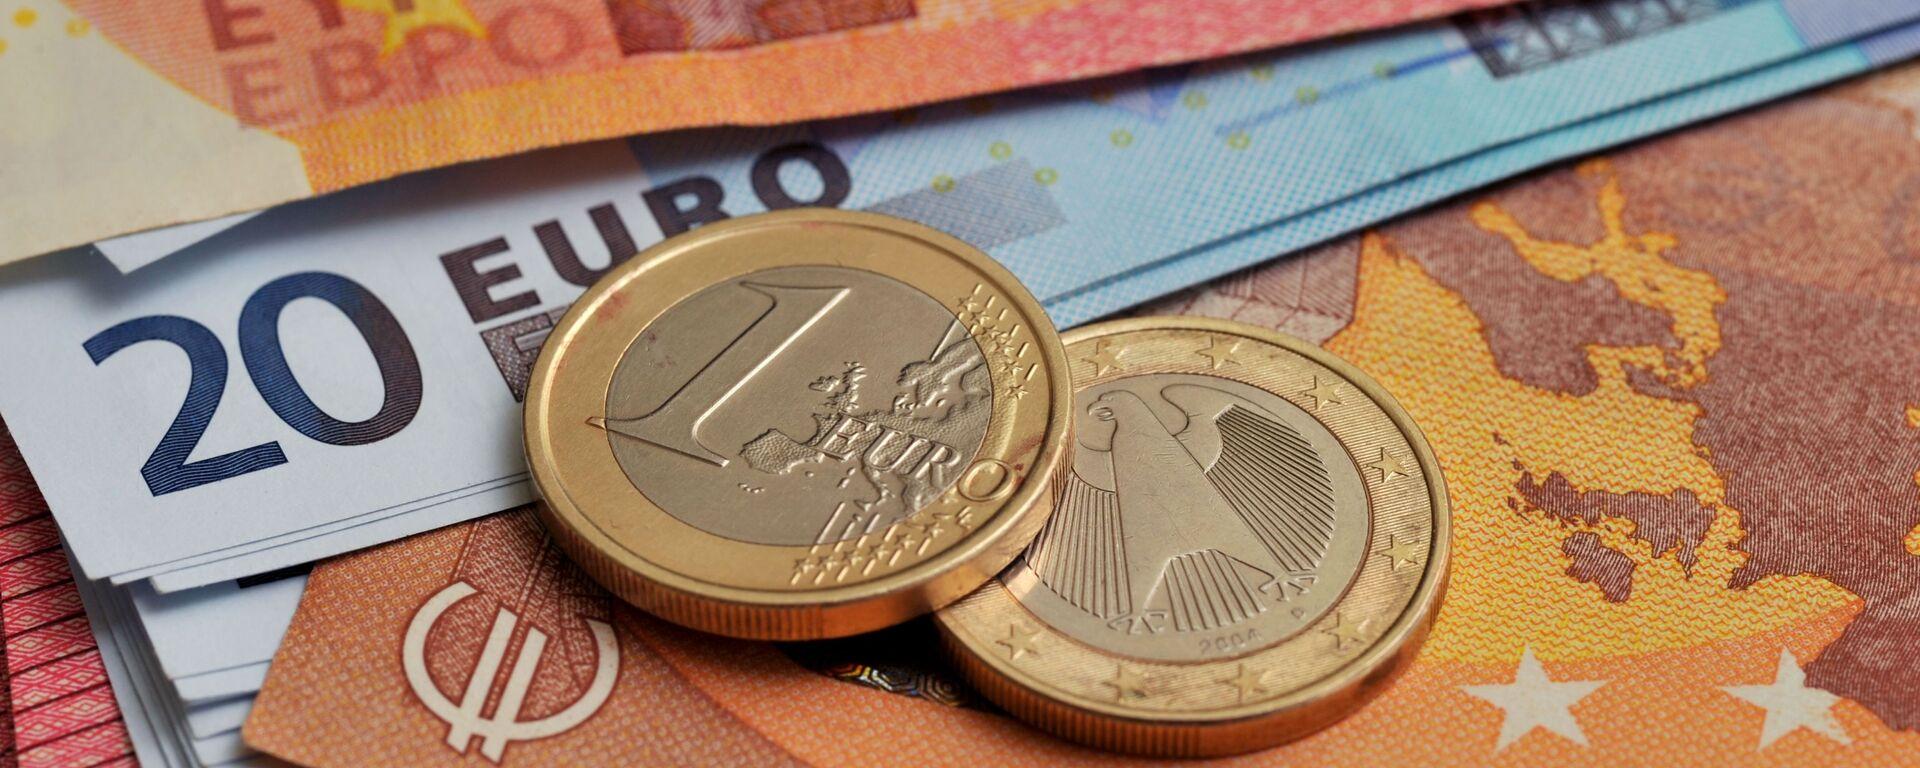 Монеты номиналом 1 евро на фоне банкнот номиналом 10 и 20 евро - Sputnik Латвия, 1920, 14.09.2021